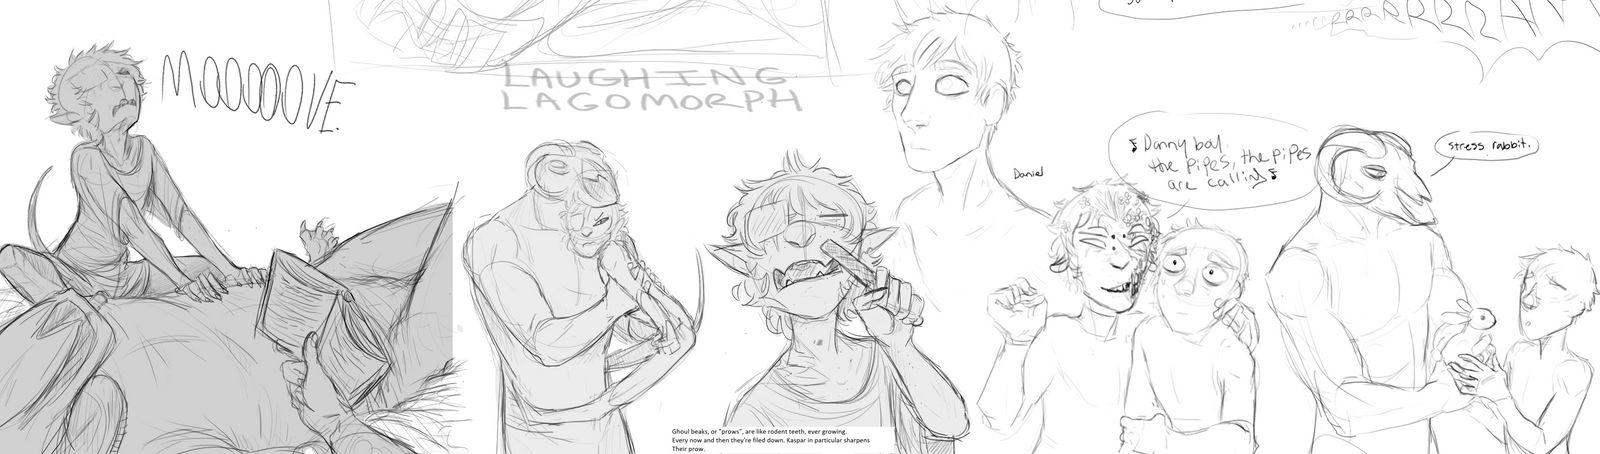 SD 24 by Laughing-Lagomorph